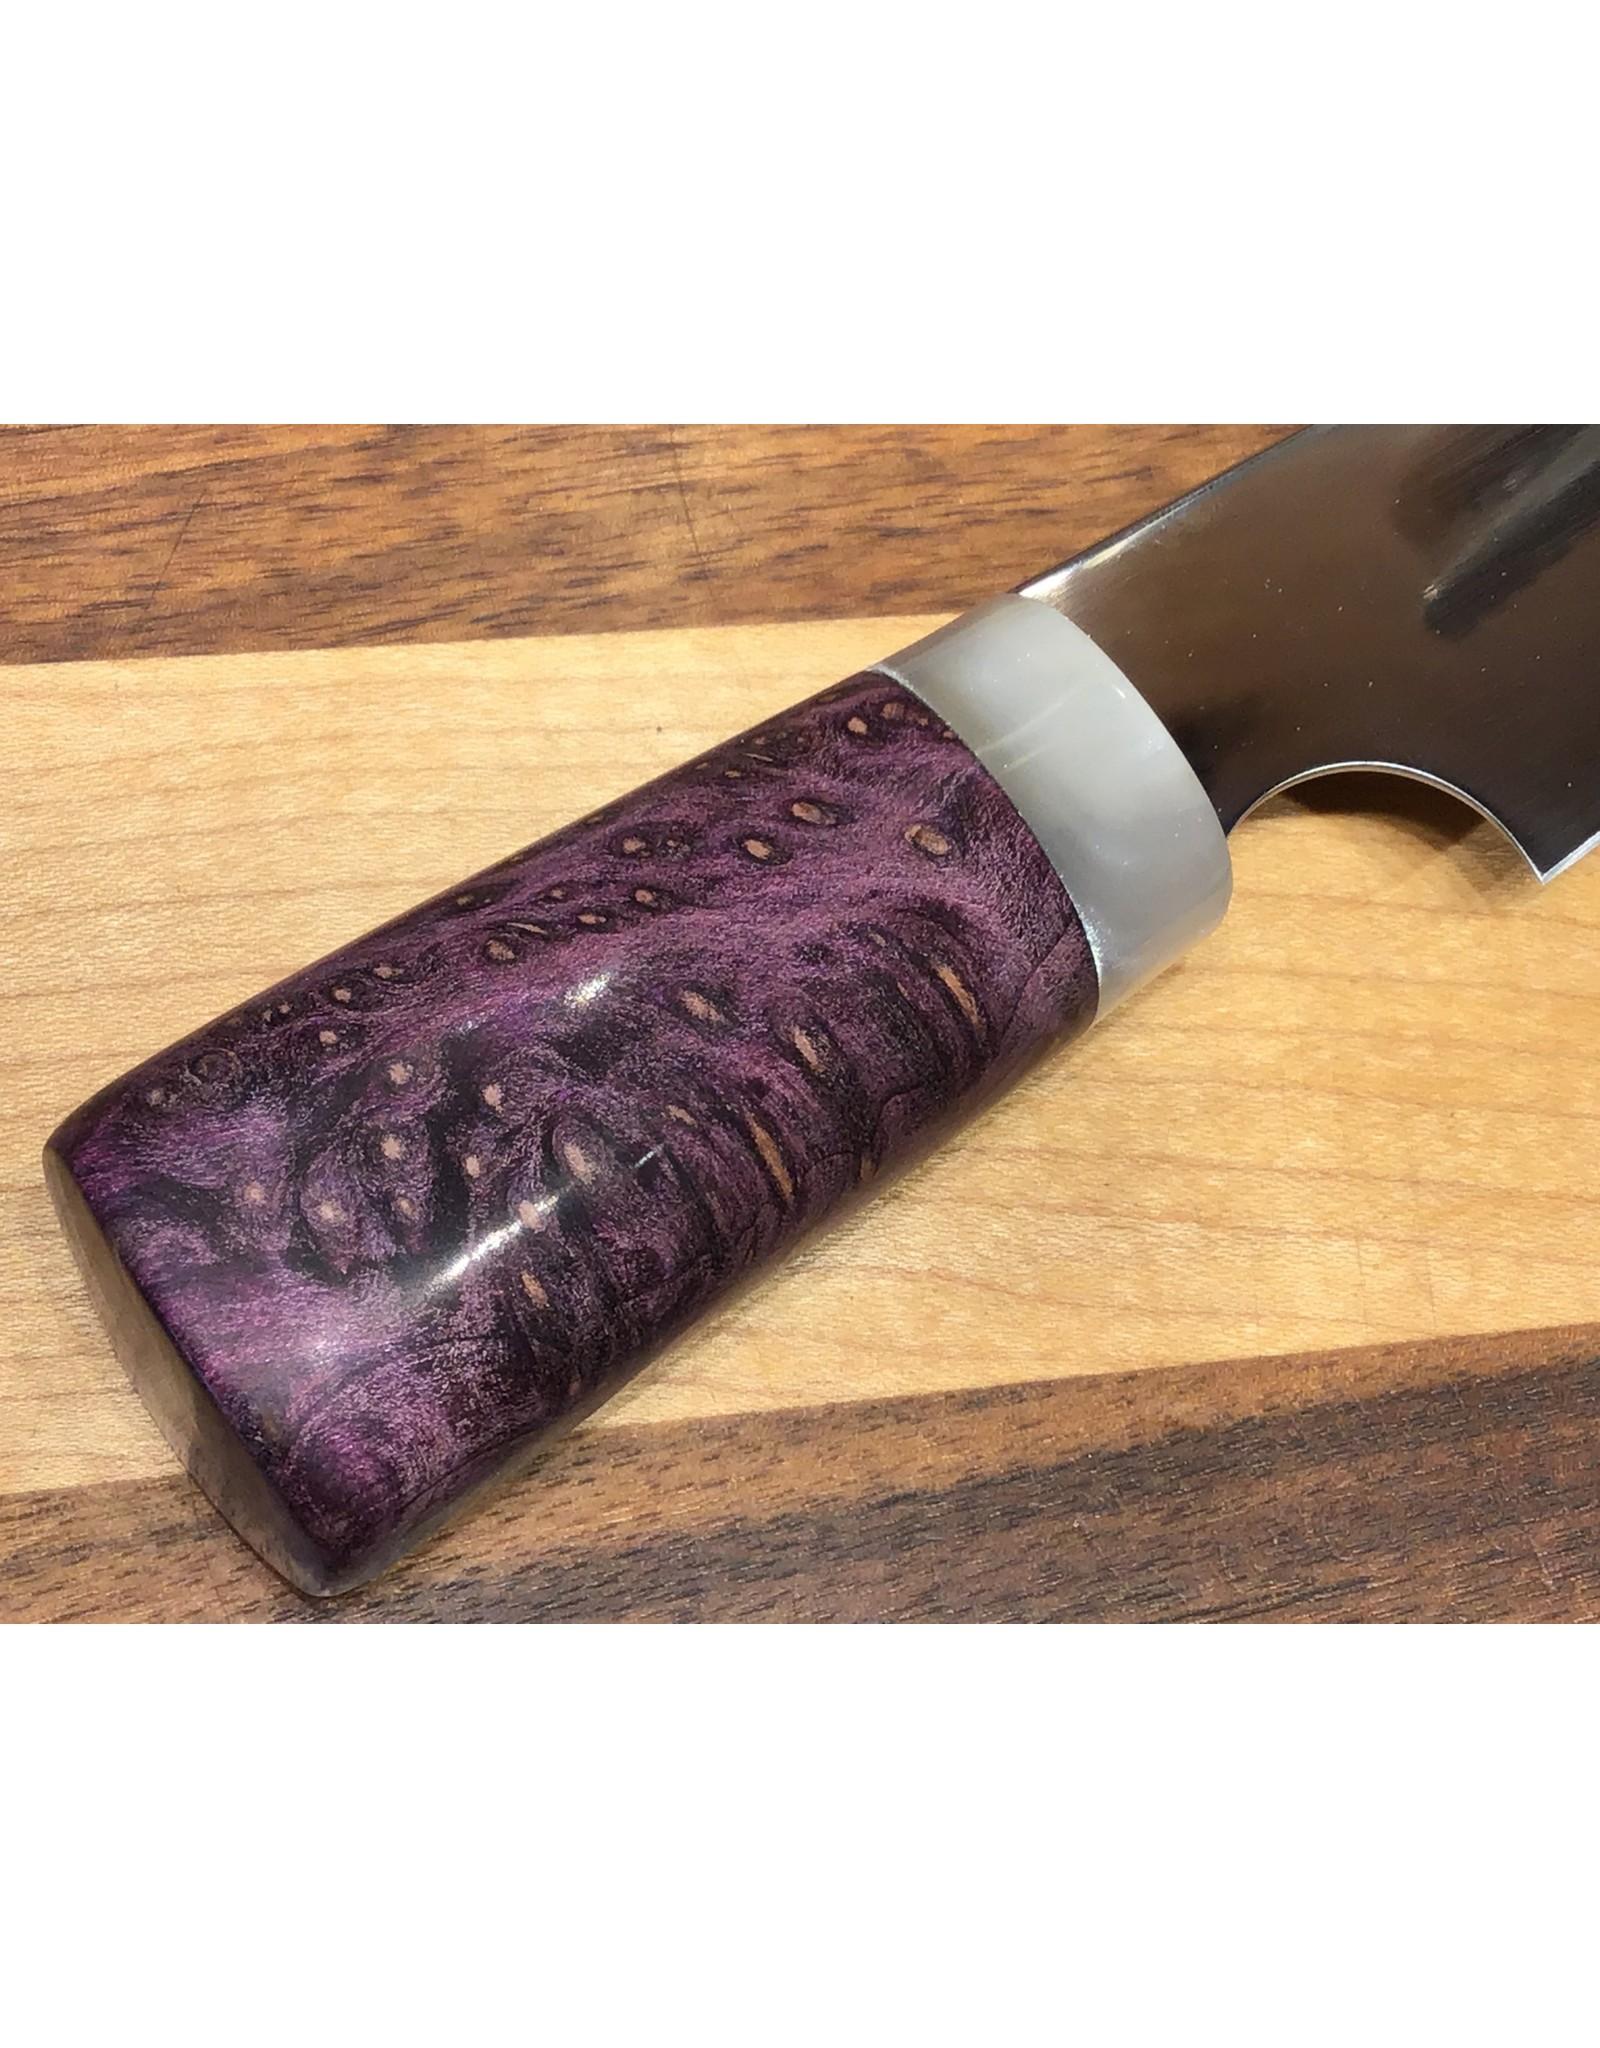 Serenity Mini Gyuto - Wa handle with Pearl Resin & Purple Box in CPM154